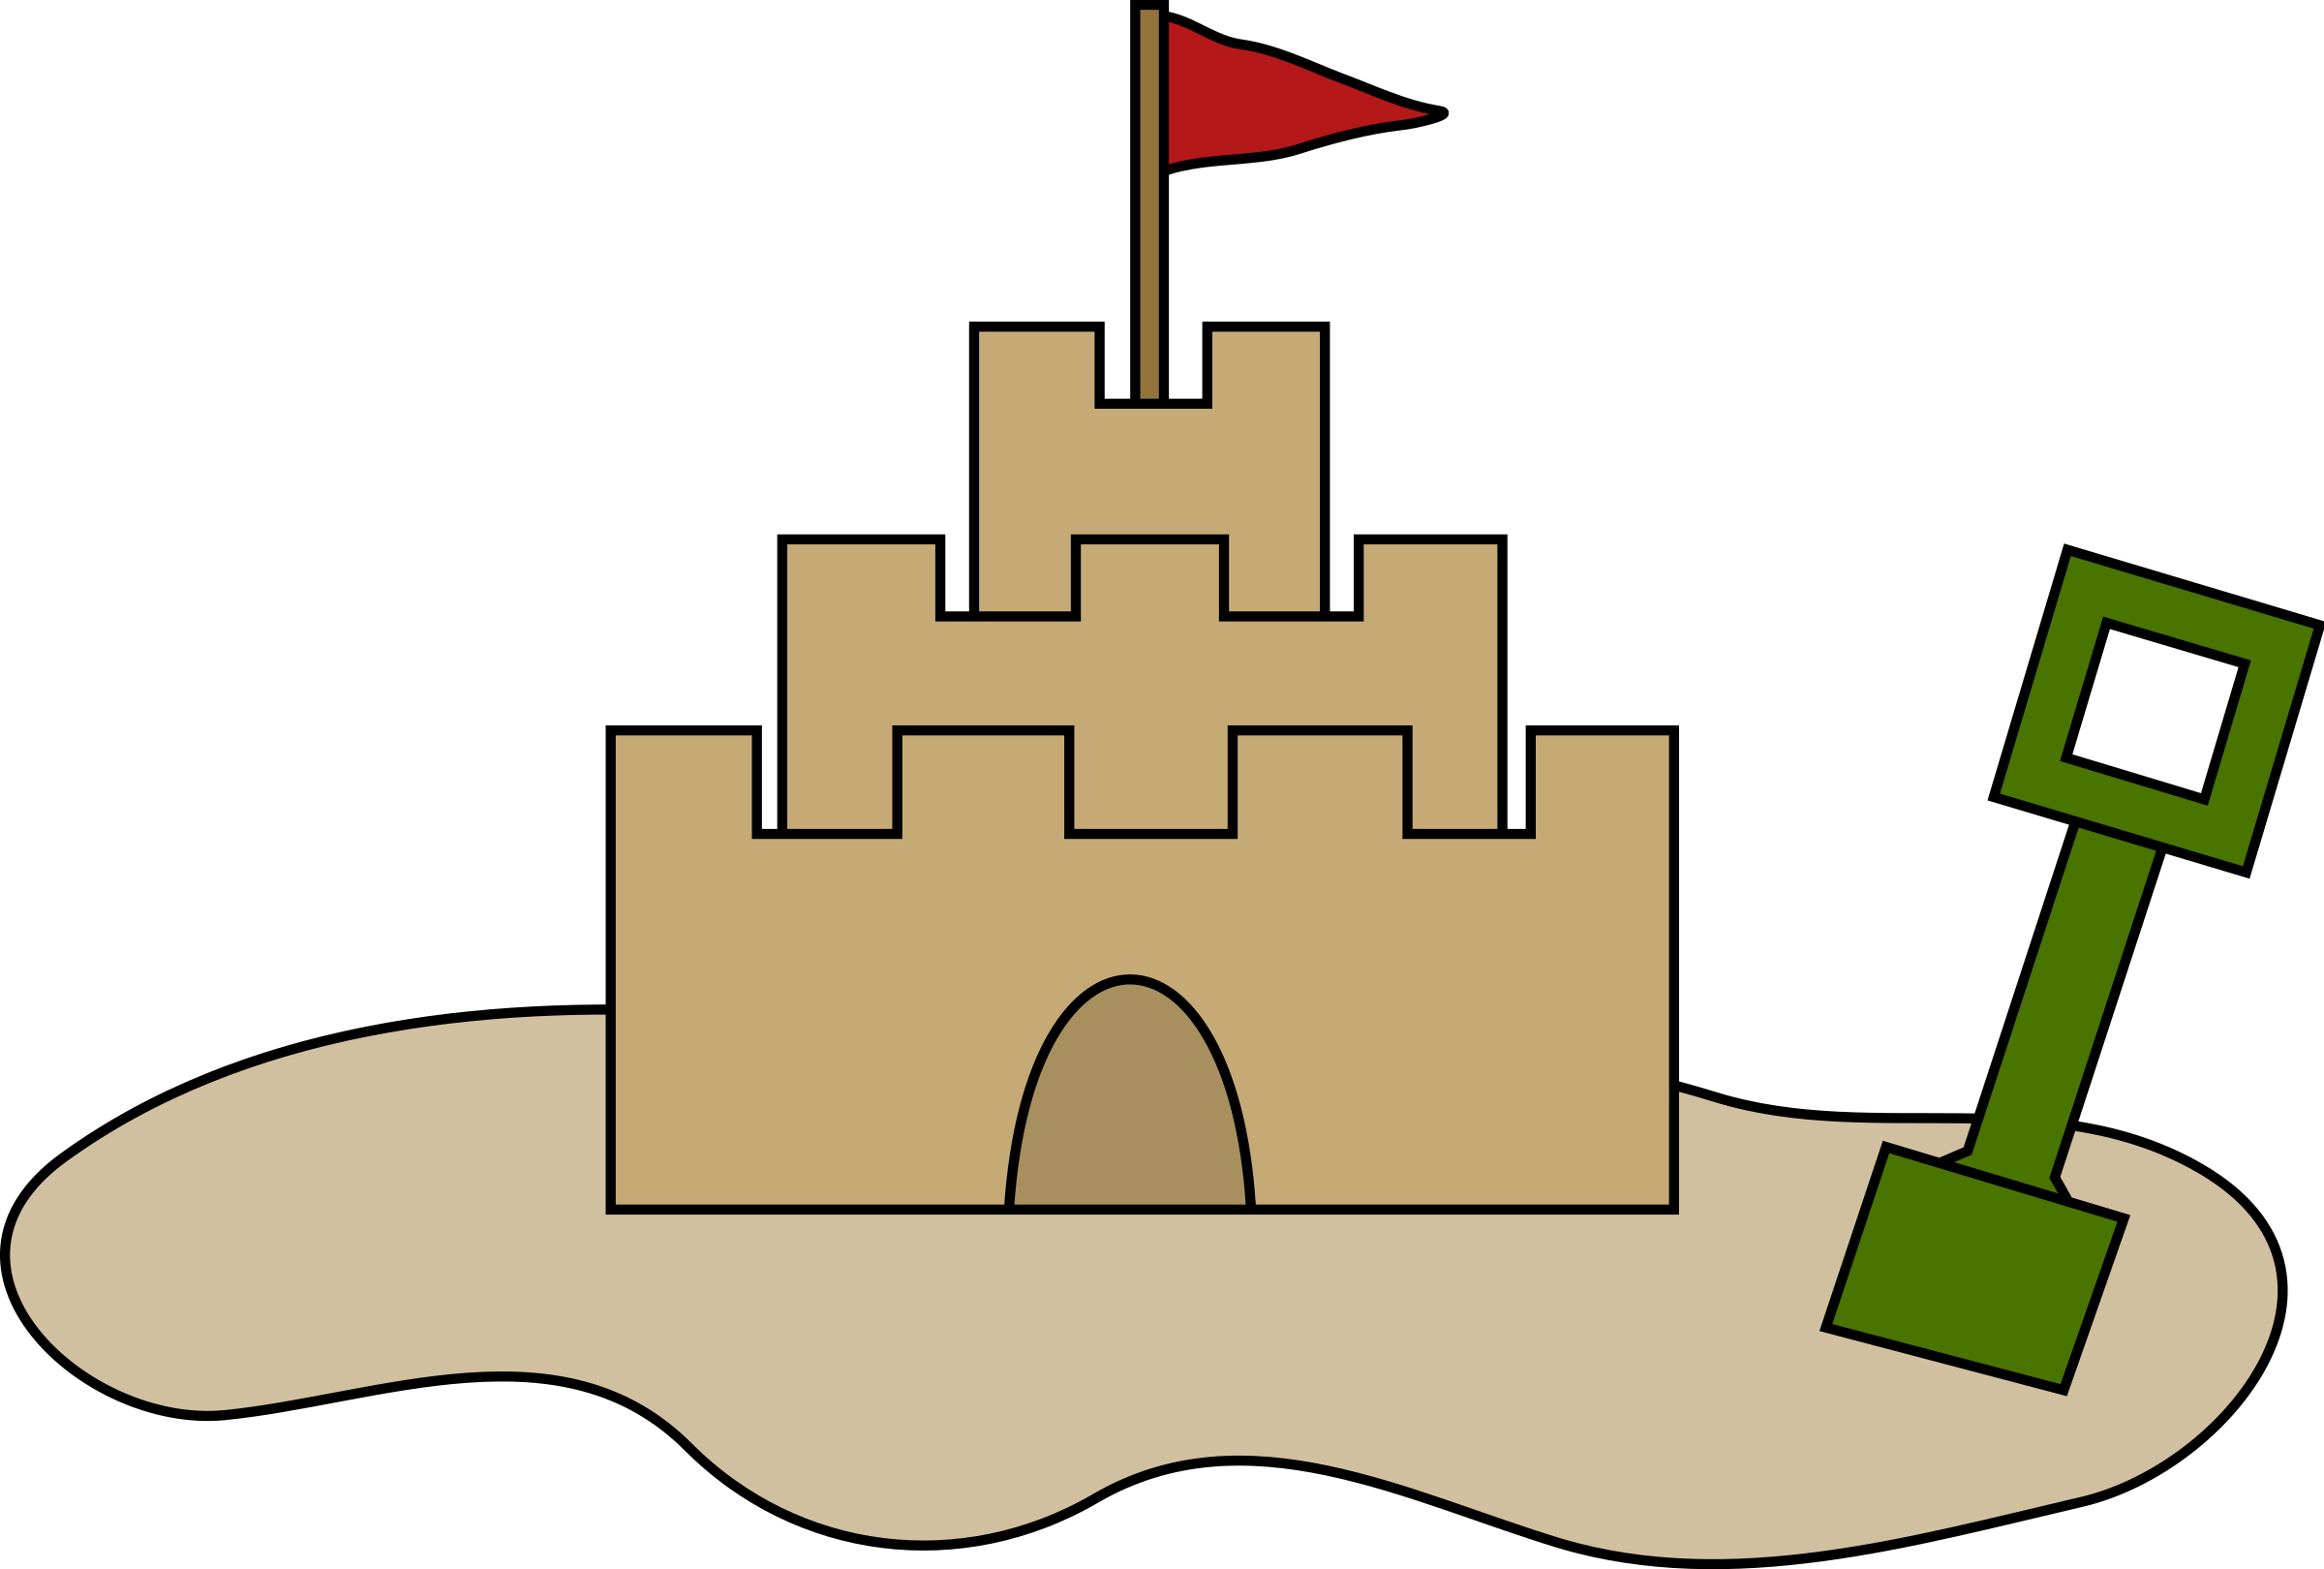 graphic freeuse download Sand Castle Clipart sable